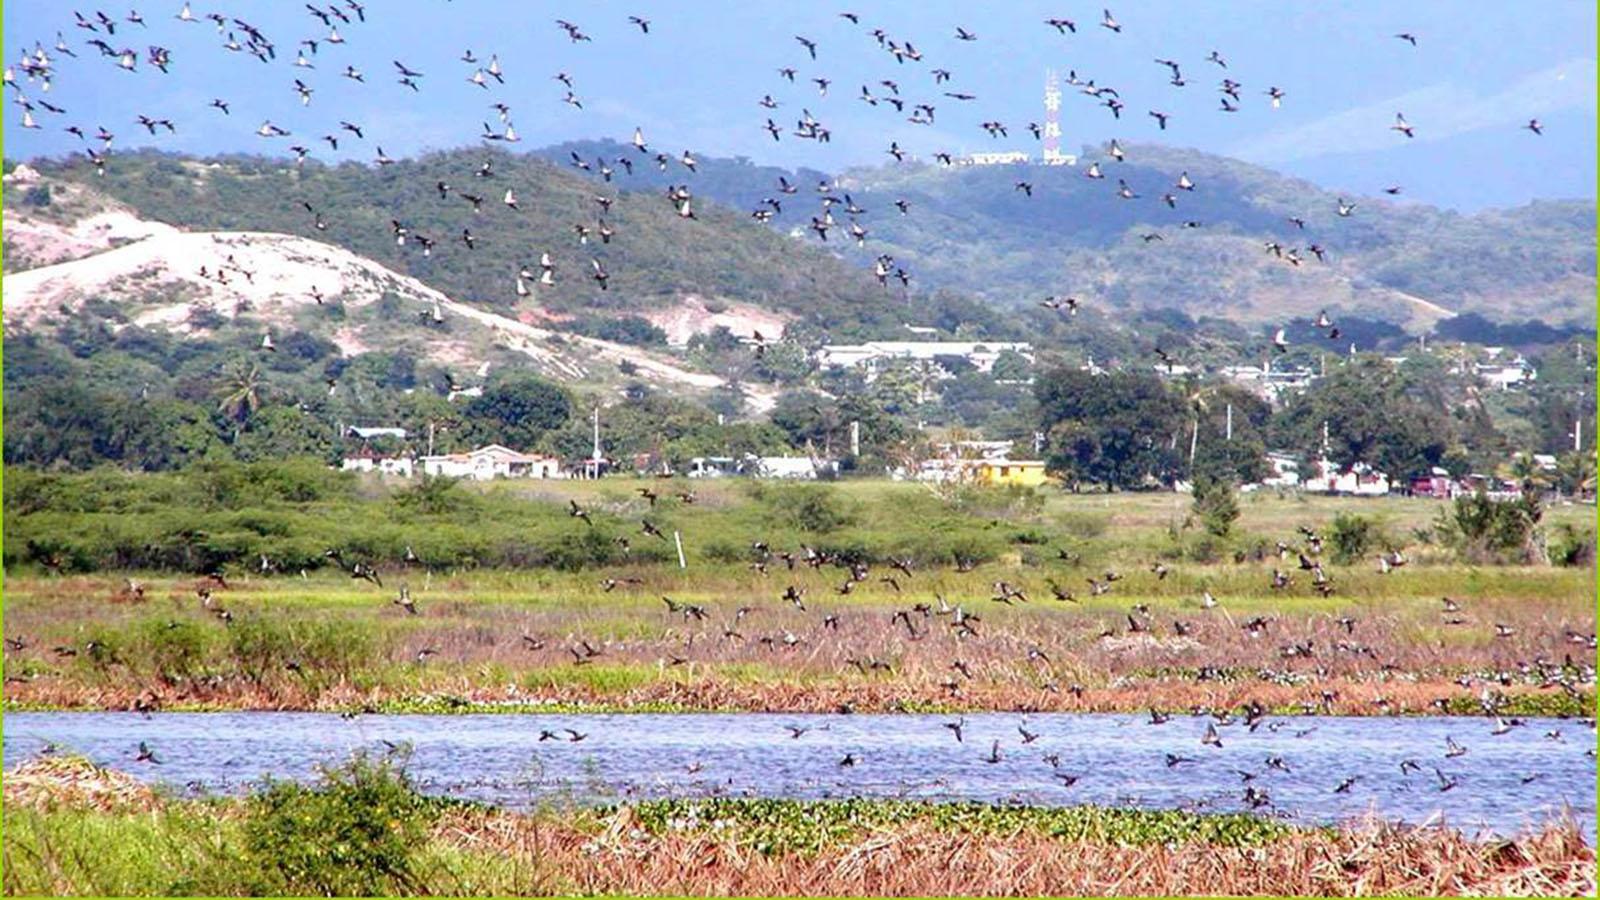 Laguna Cartagena en Lajas. (Archivo / USFWS)